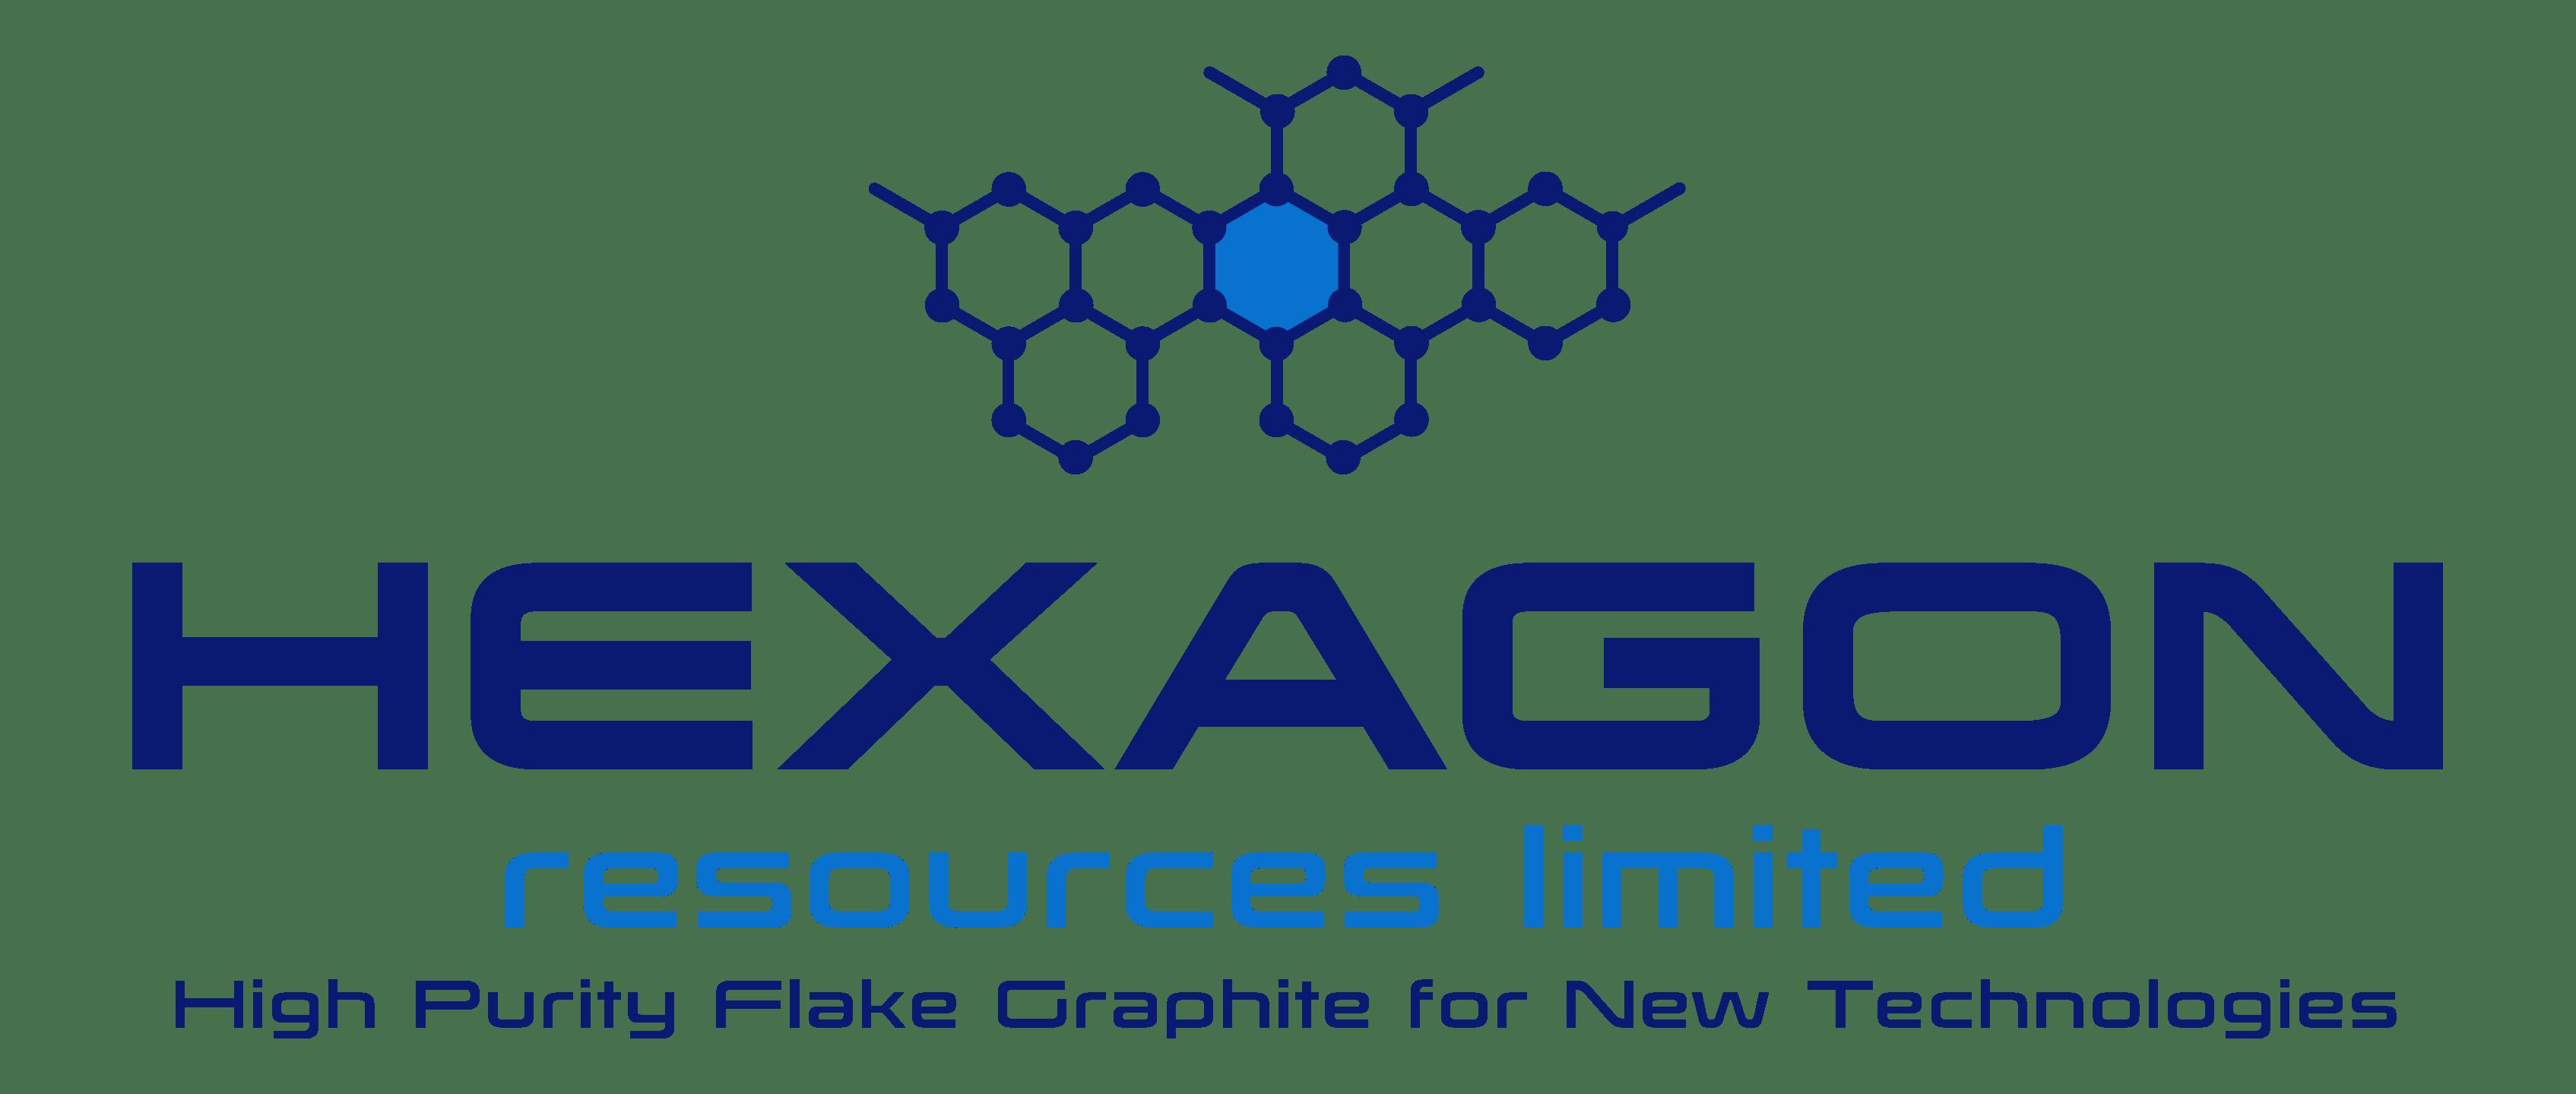 hexagon-resources-logo